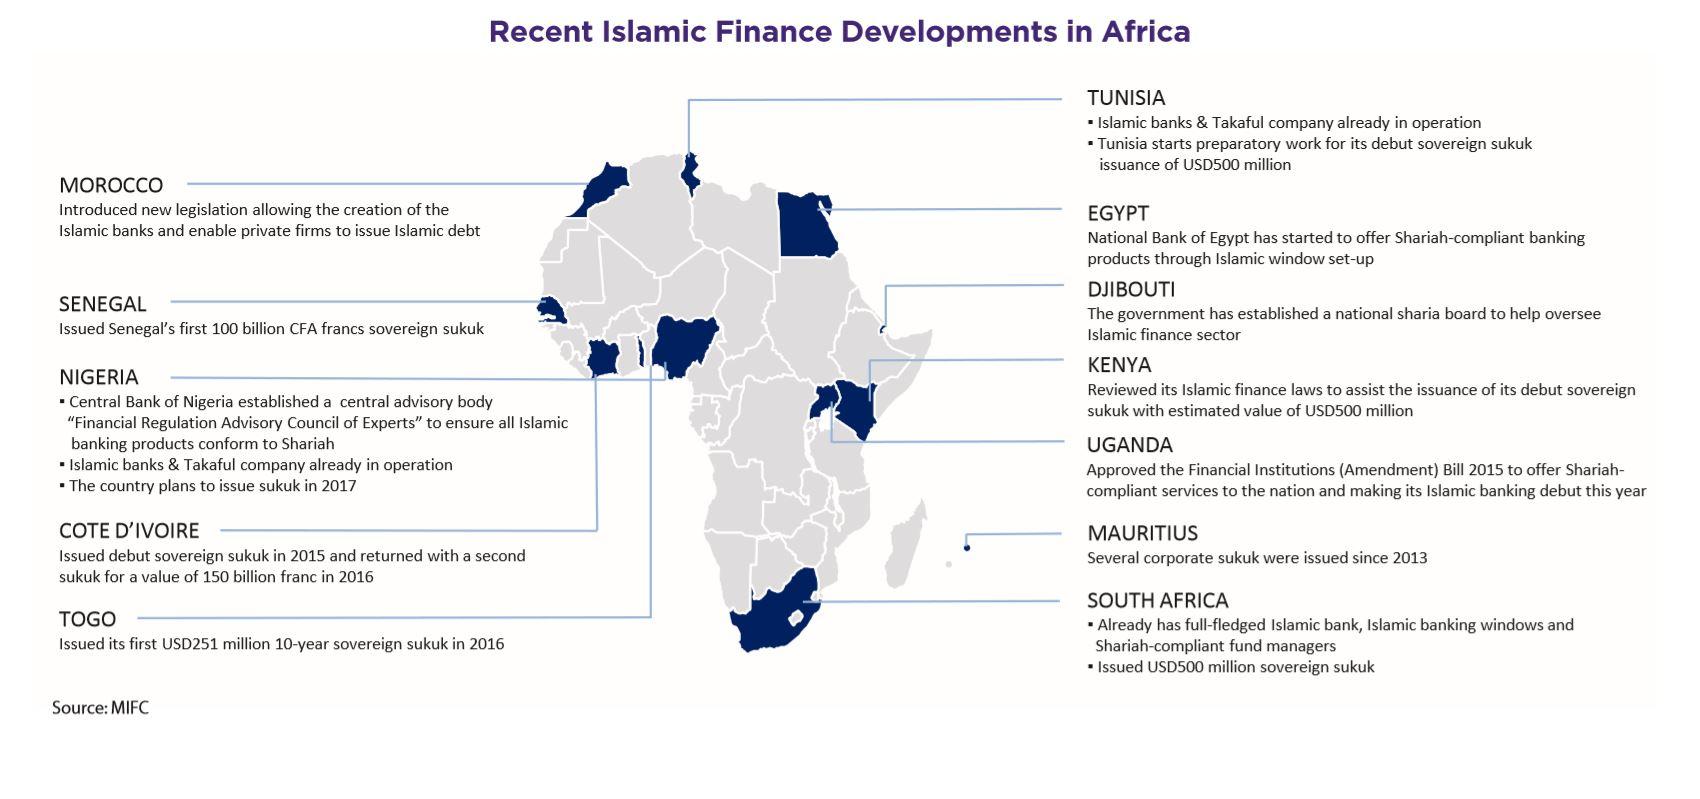 Recent Islamic Finance Developments in Africa